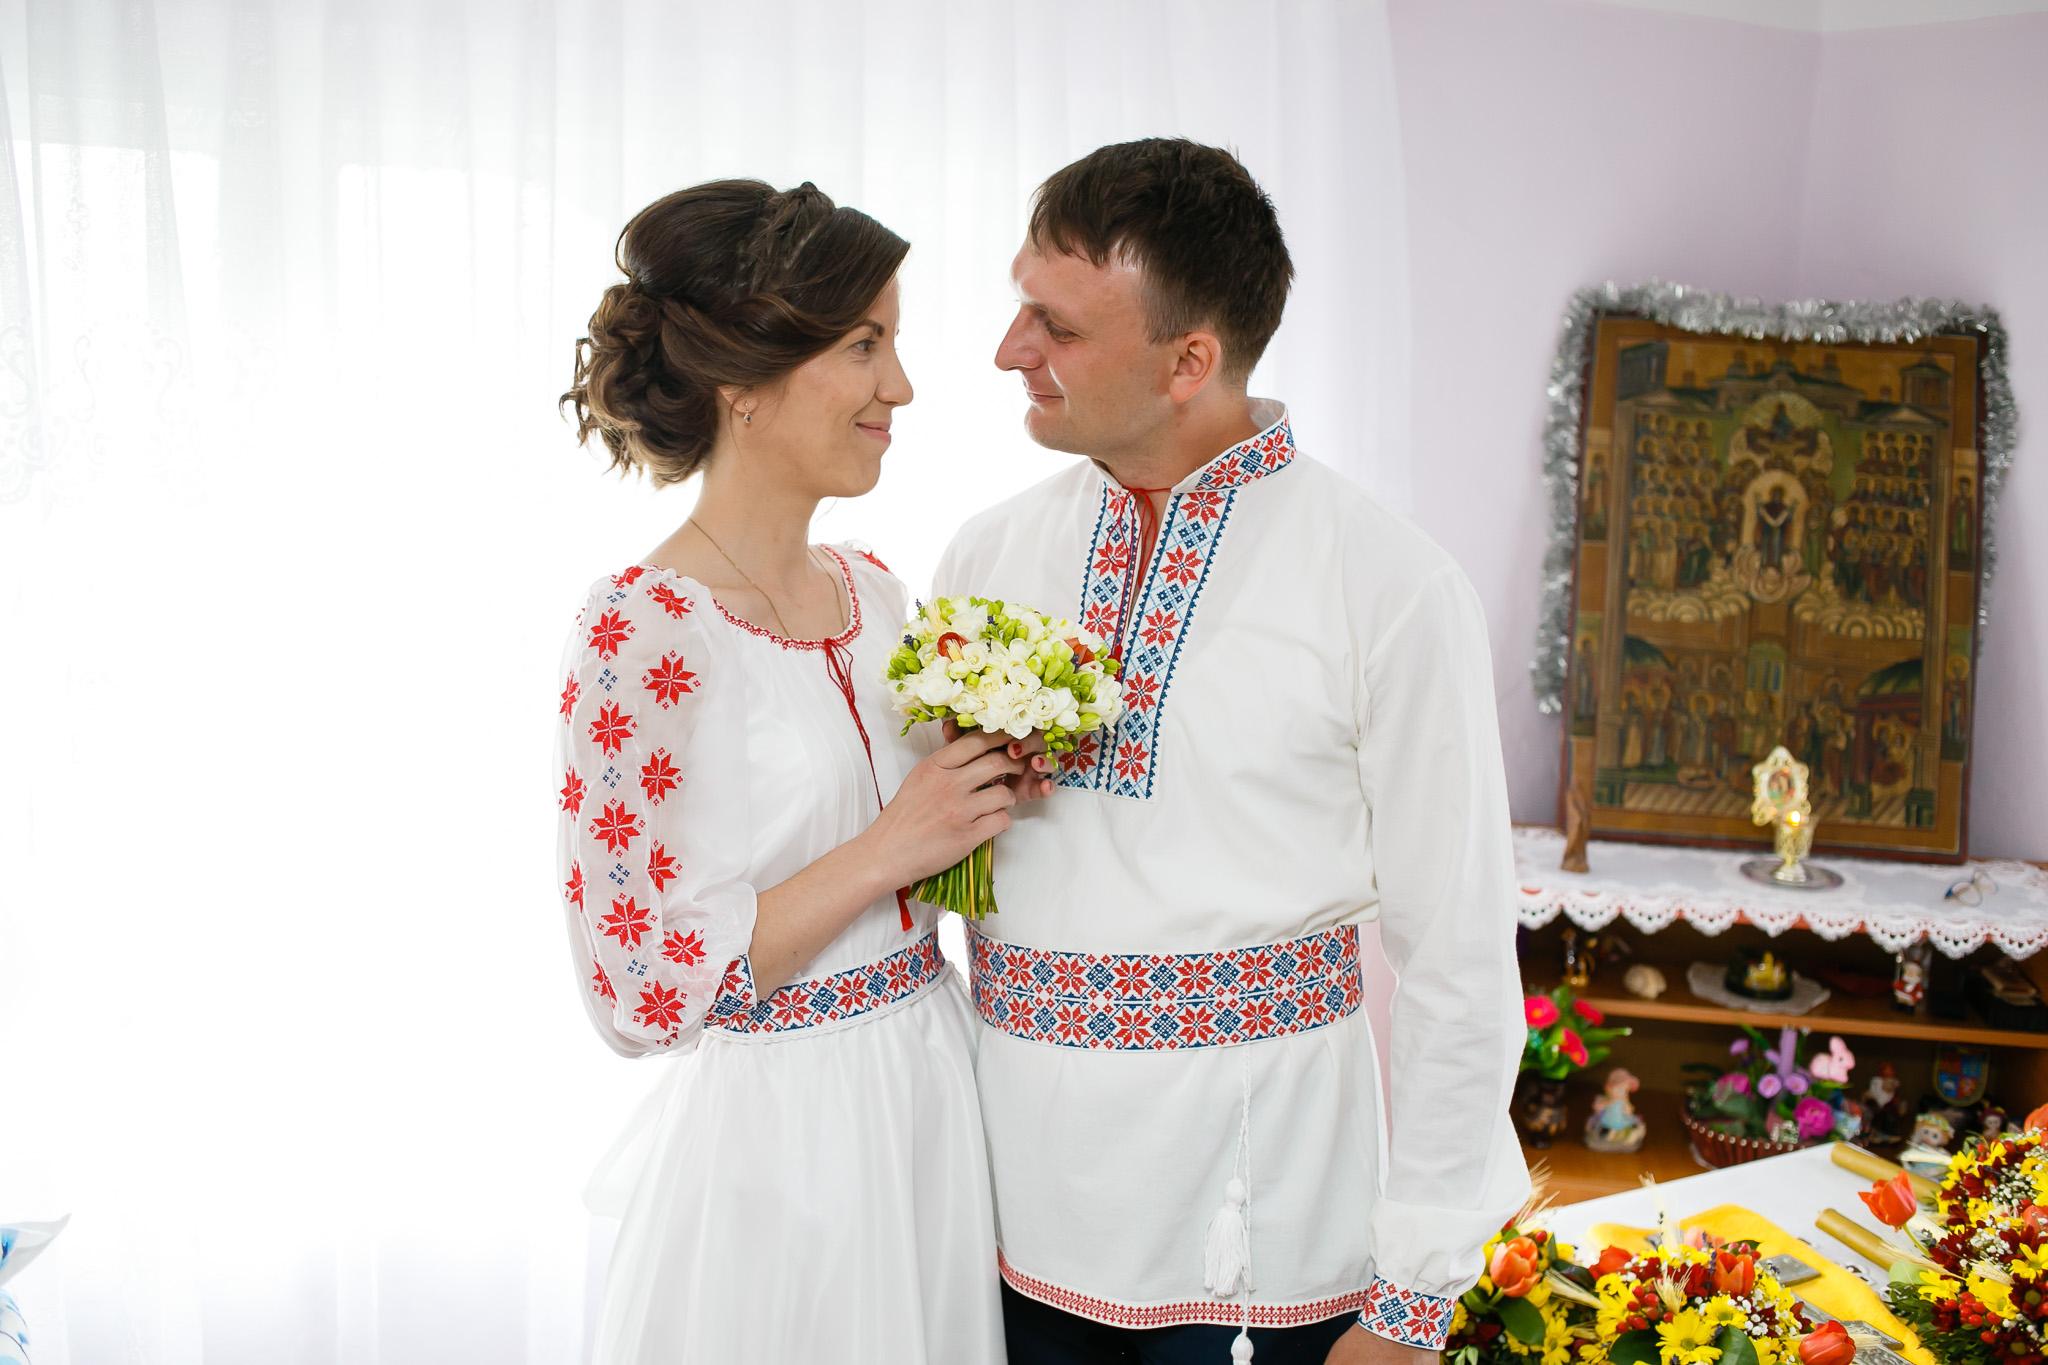 Nuntă tradițională Elisabeta și Alexandru fotograf profesionist nunta Iasi www.paulpadurariu.ro © 2018 Paul Padurariu pregatiri miri 4